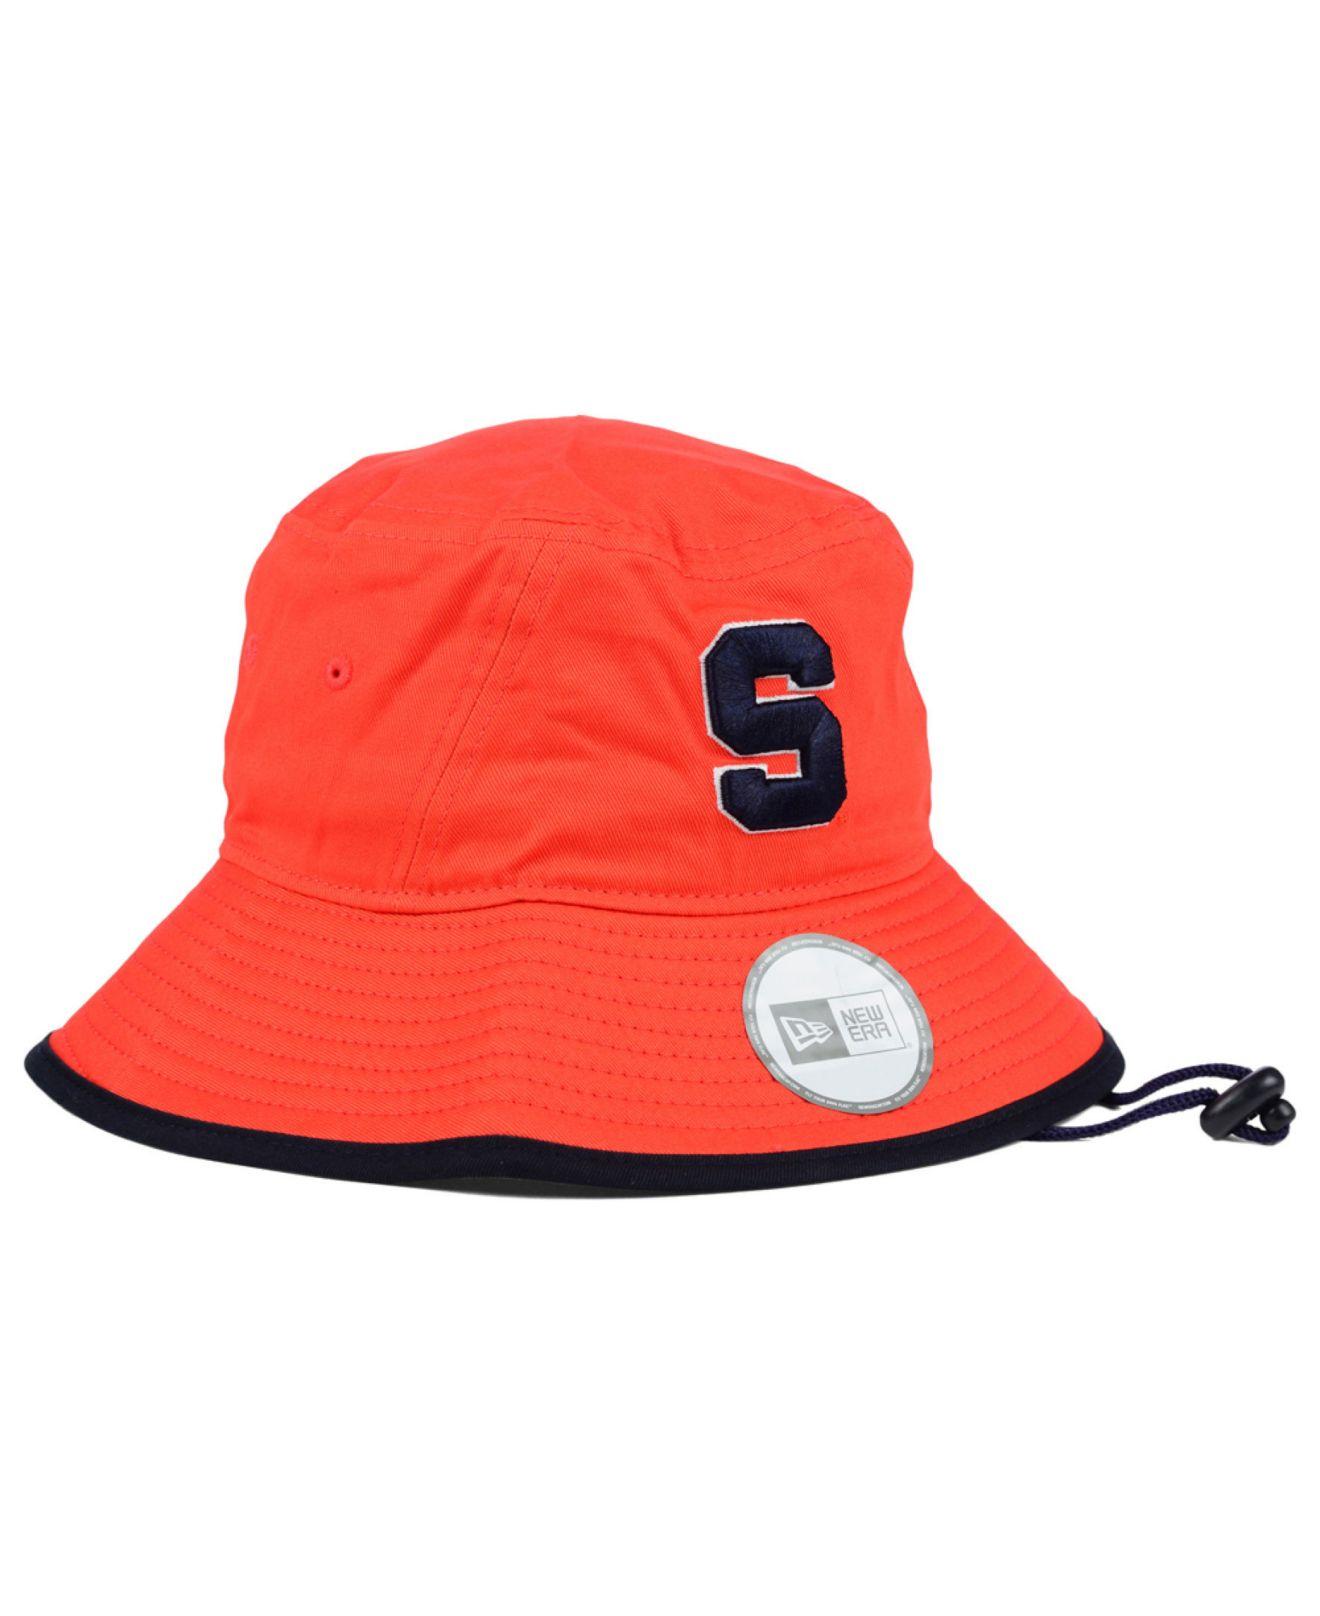 buy online 3503f 77c3e spain lyst ktz syracuse orange tip bucket hat in orange for men e0c7b 561fb